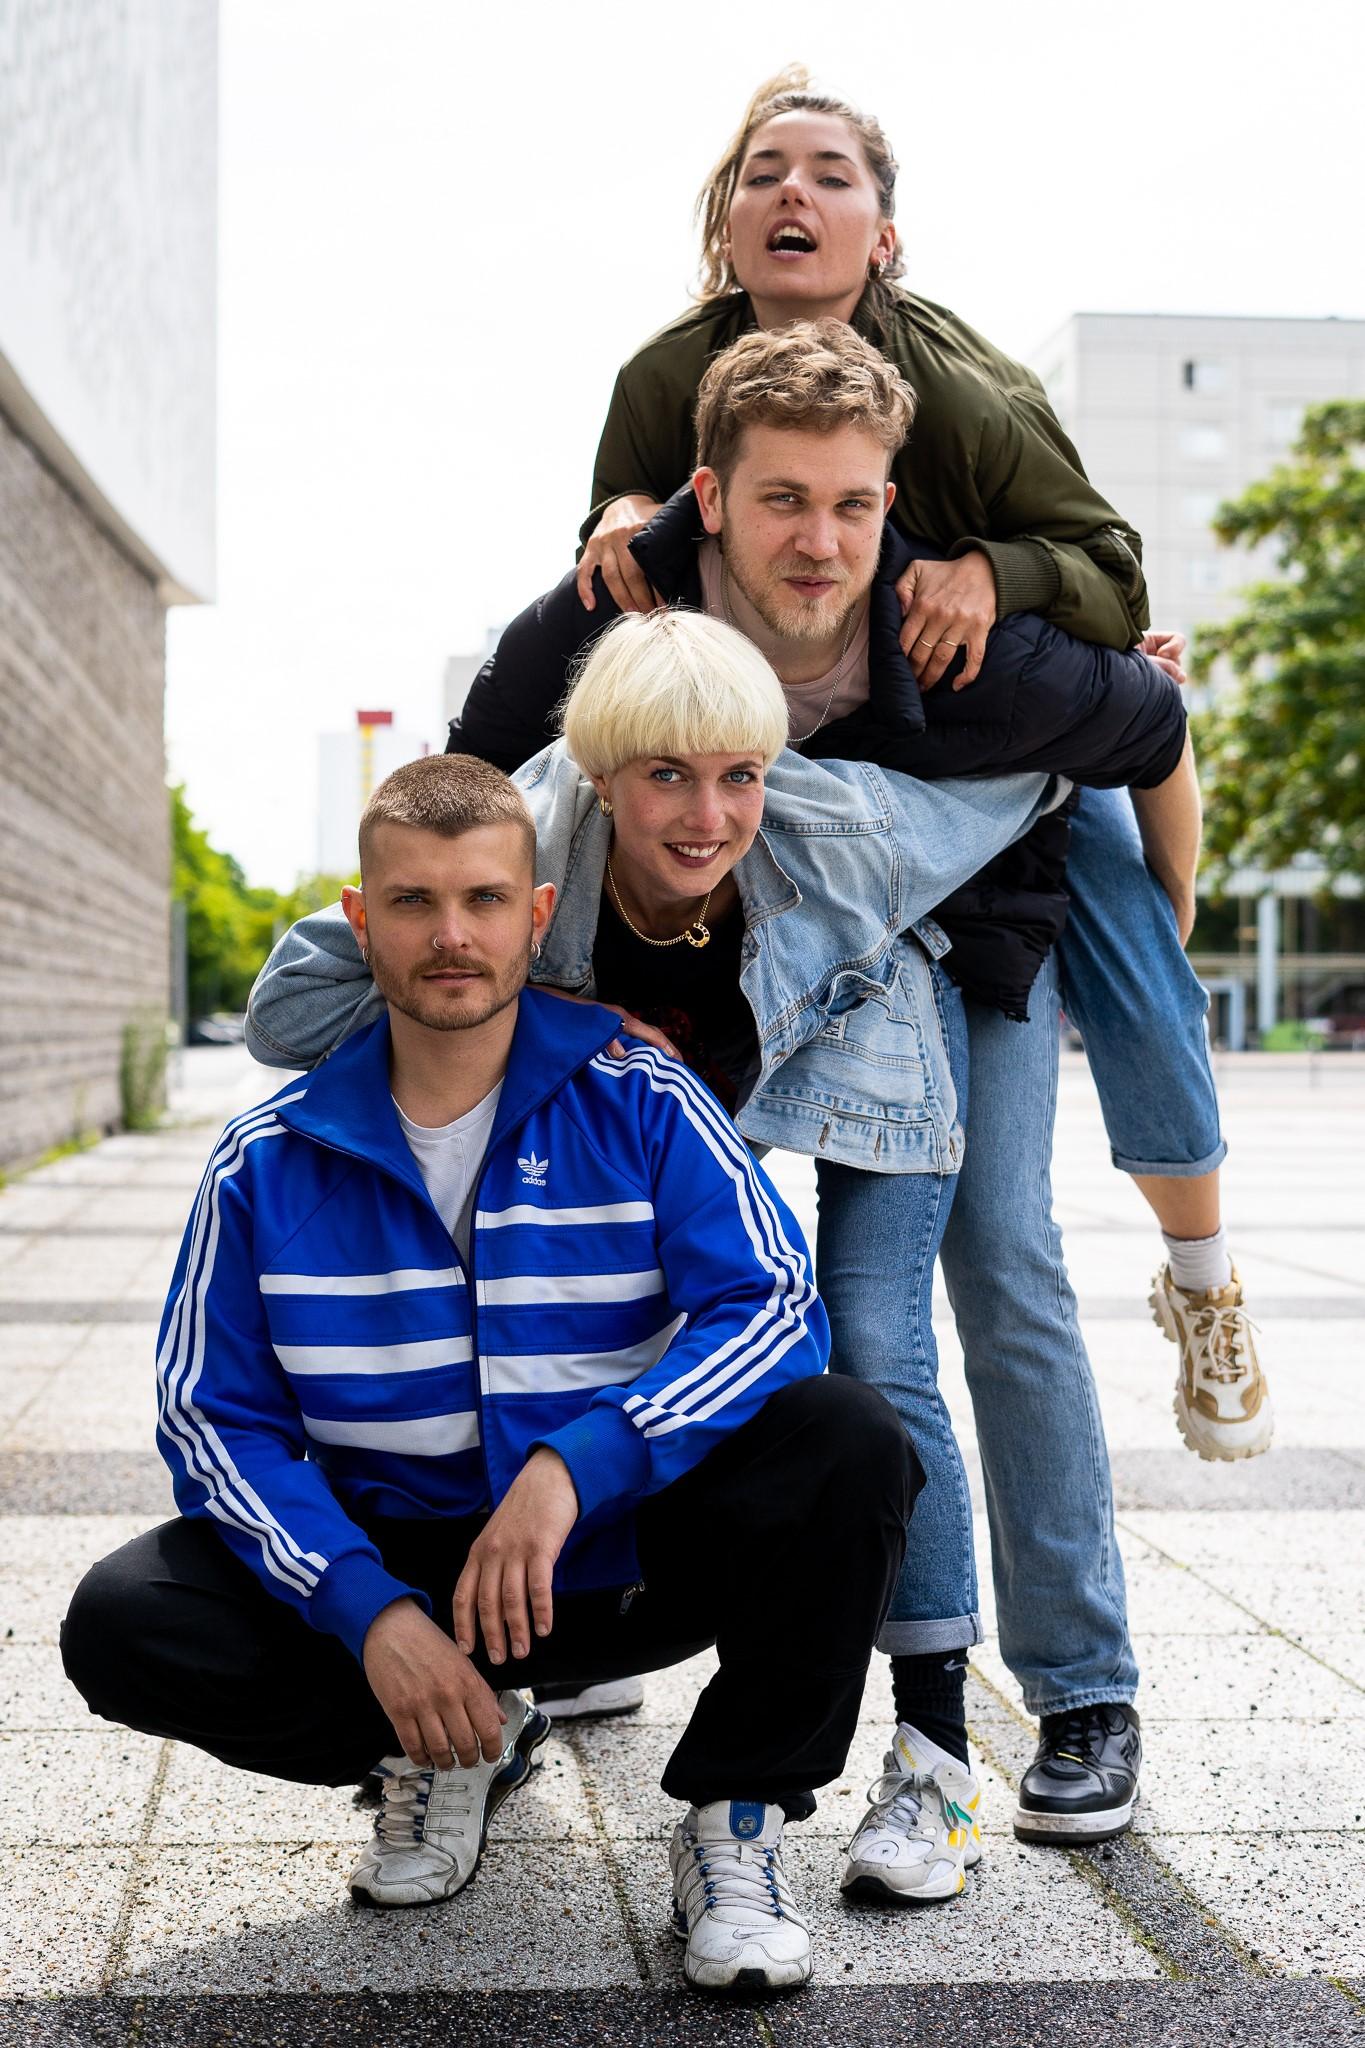 The tutti d*amore team. (Photo: Nicola Fegg / tutti d*amore)